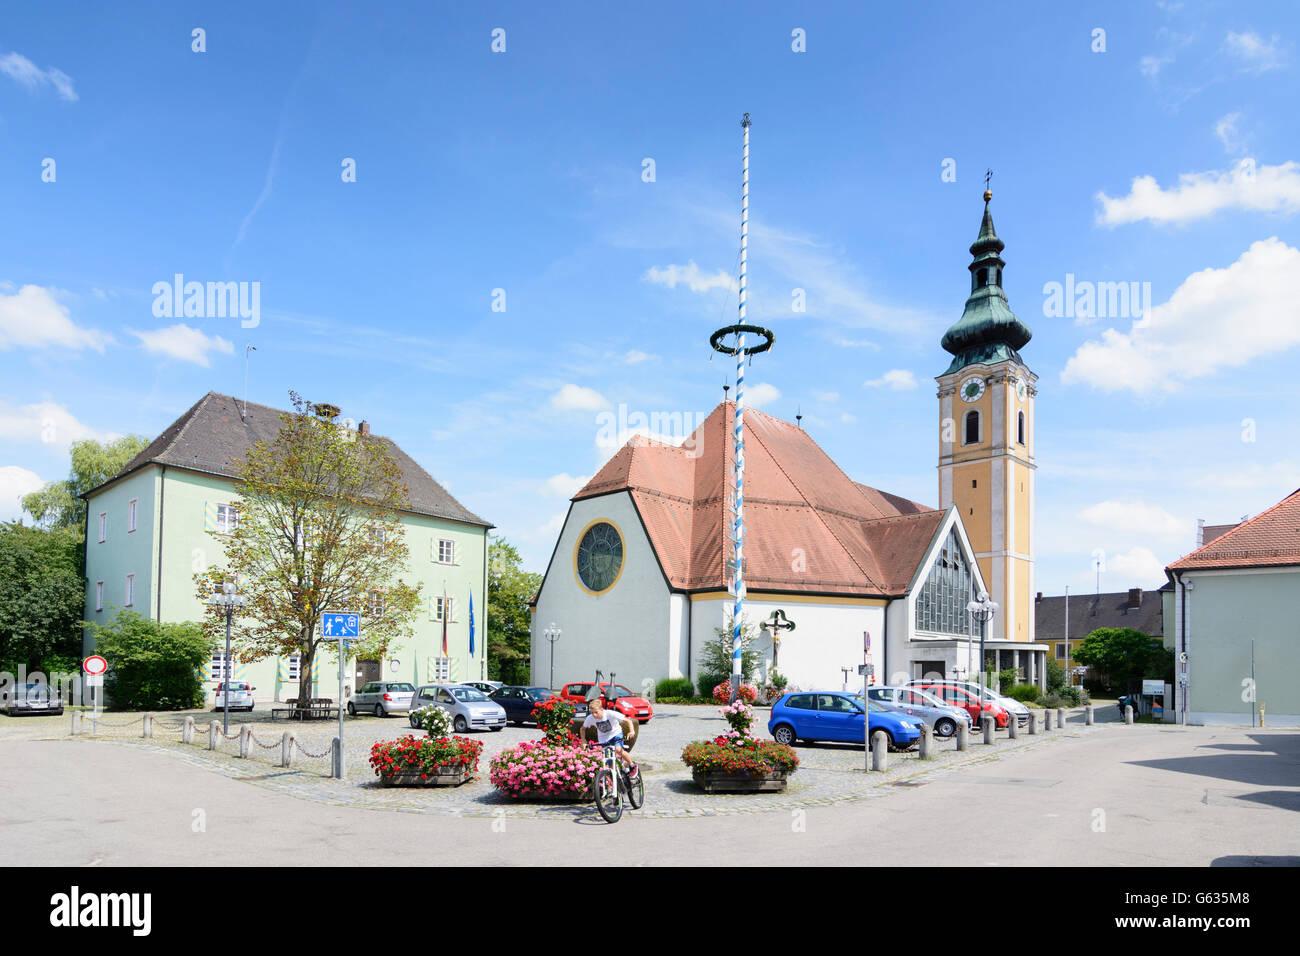 square Kirchplatz, church Unsere Liebe Frau, Town Hall, maypole, Nittenau, Germany, Bayern, Bavaria, Oberpfalz, - Stock Image